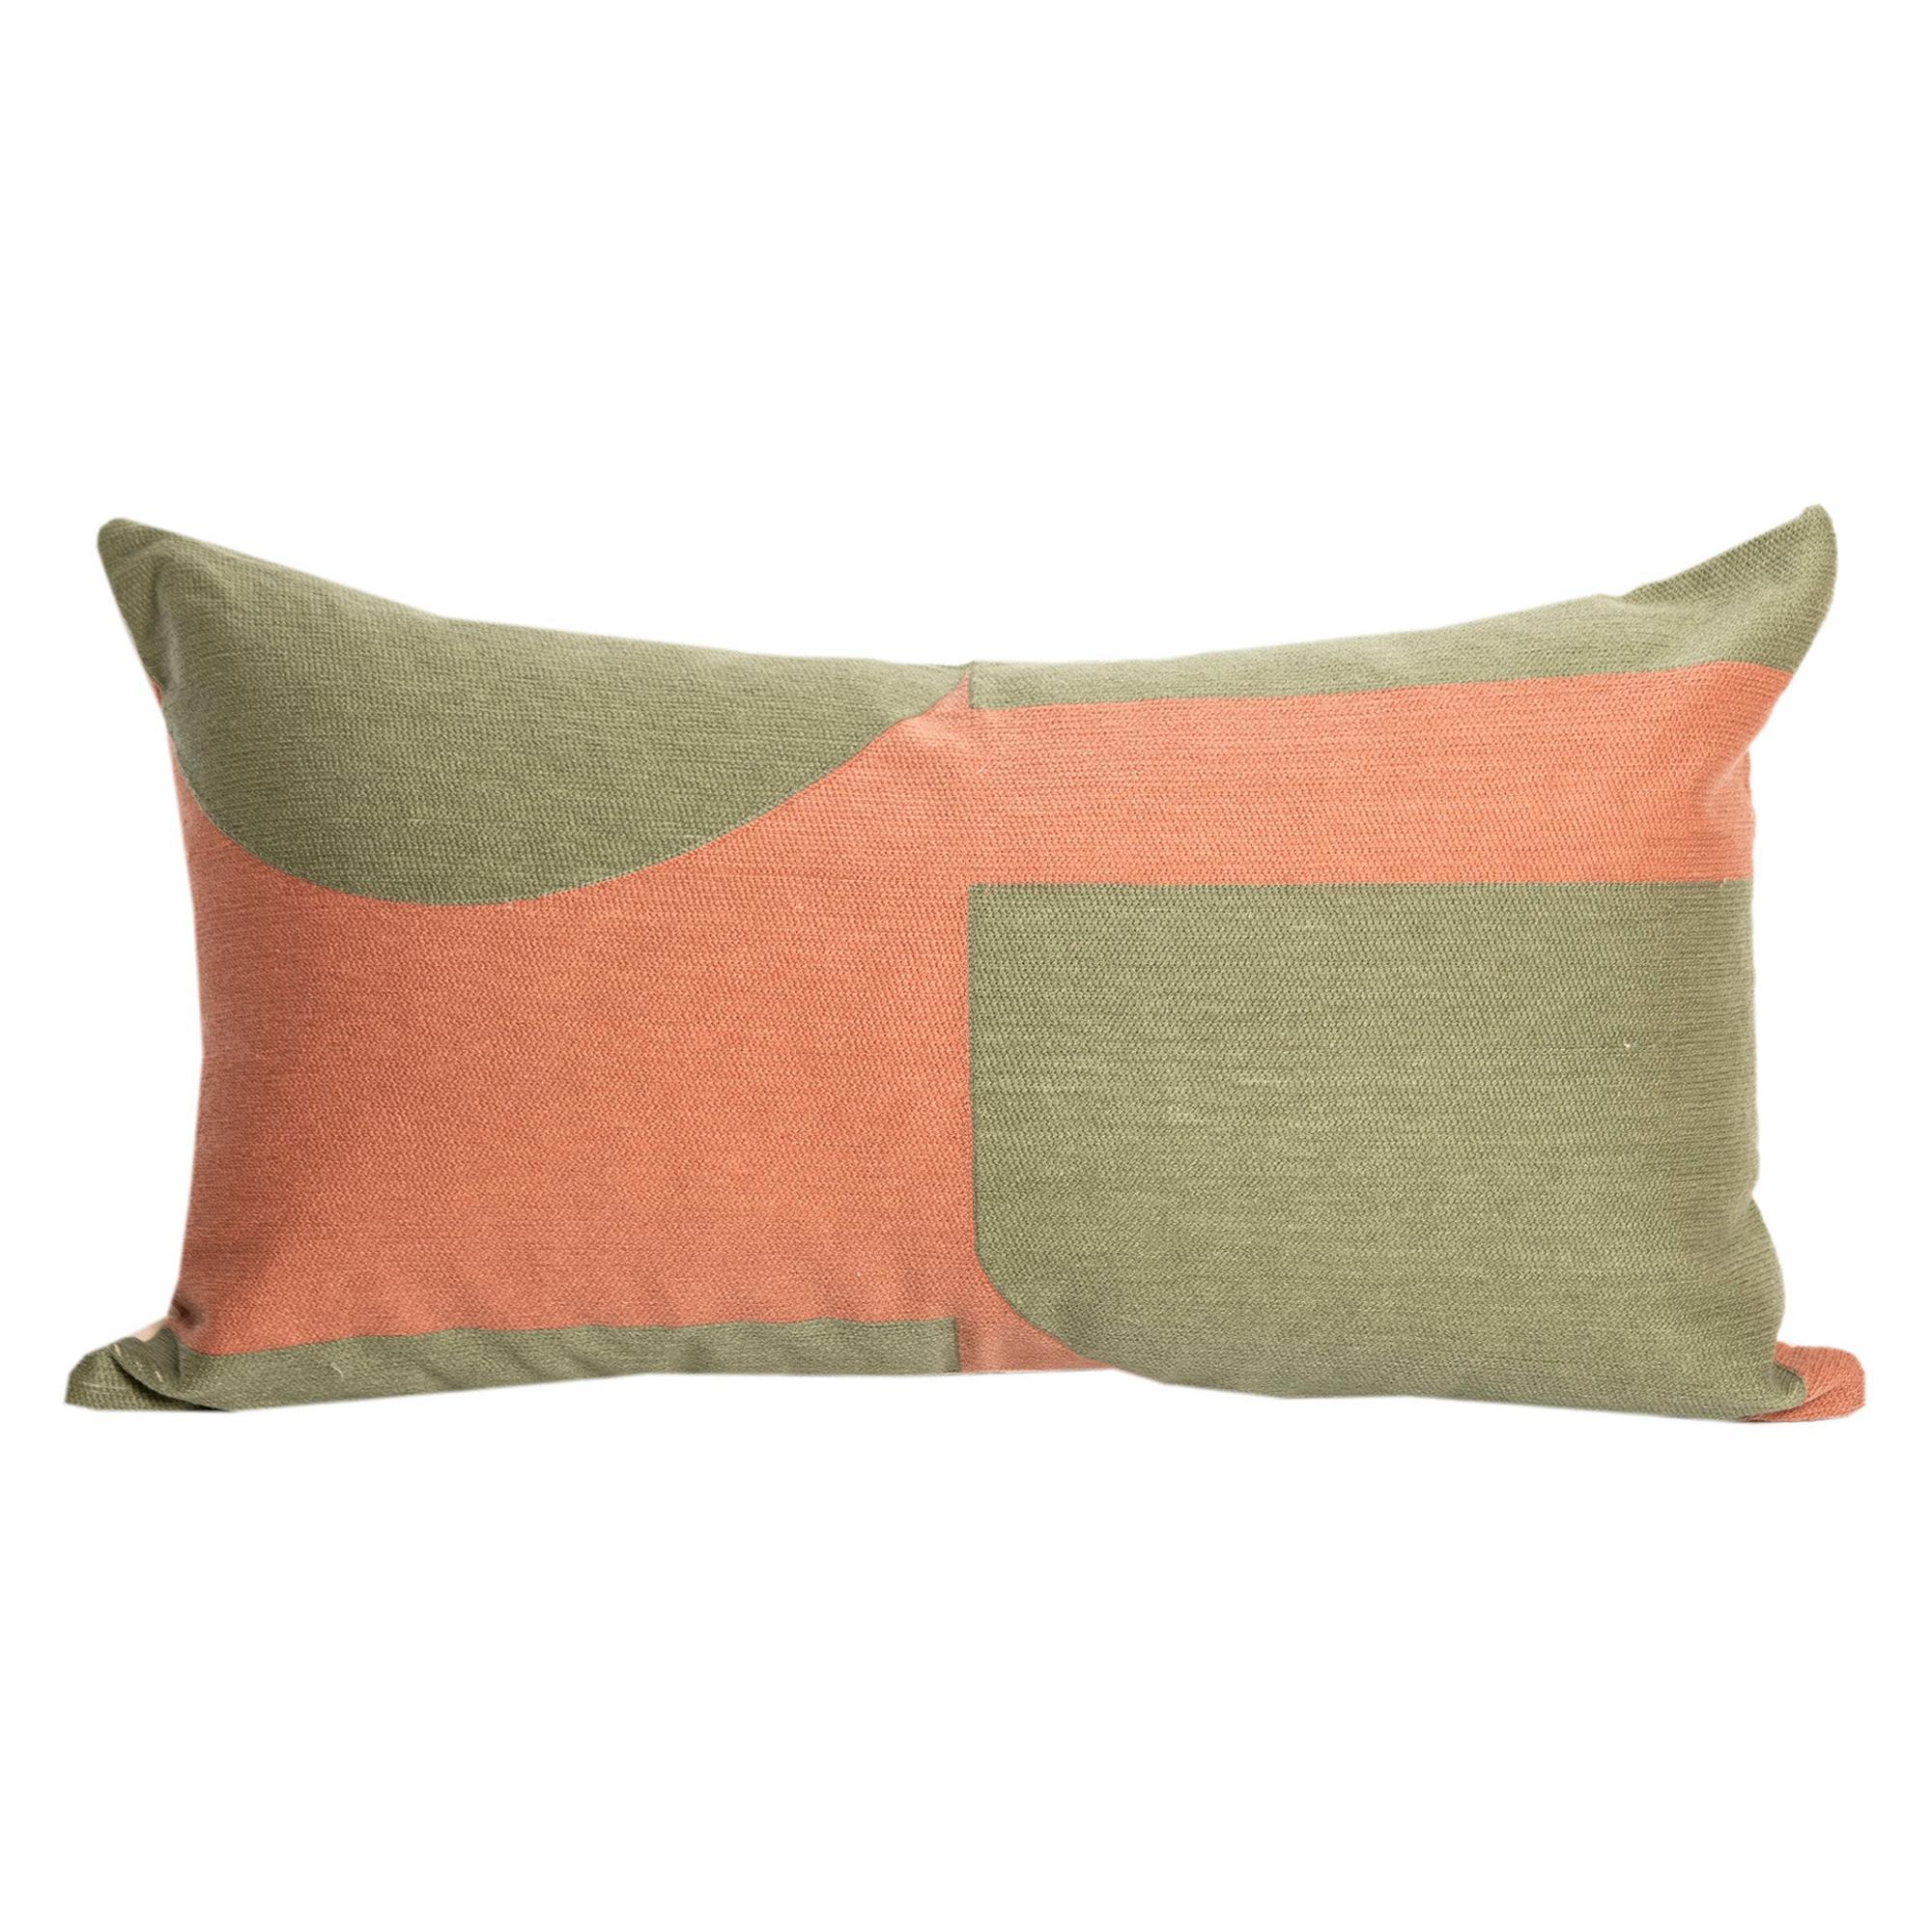 Modern Kilombo Home Embroidery Pillow Cotton Pac-Man Salmon&Green